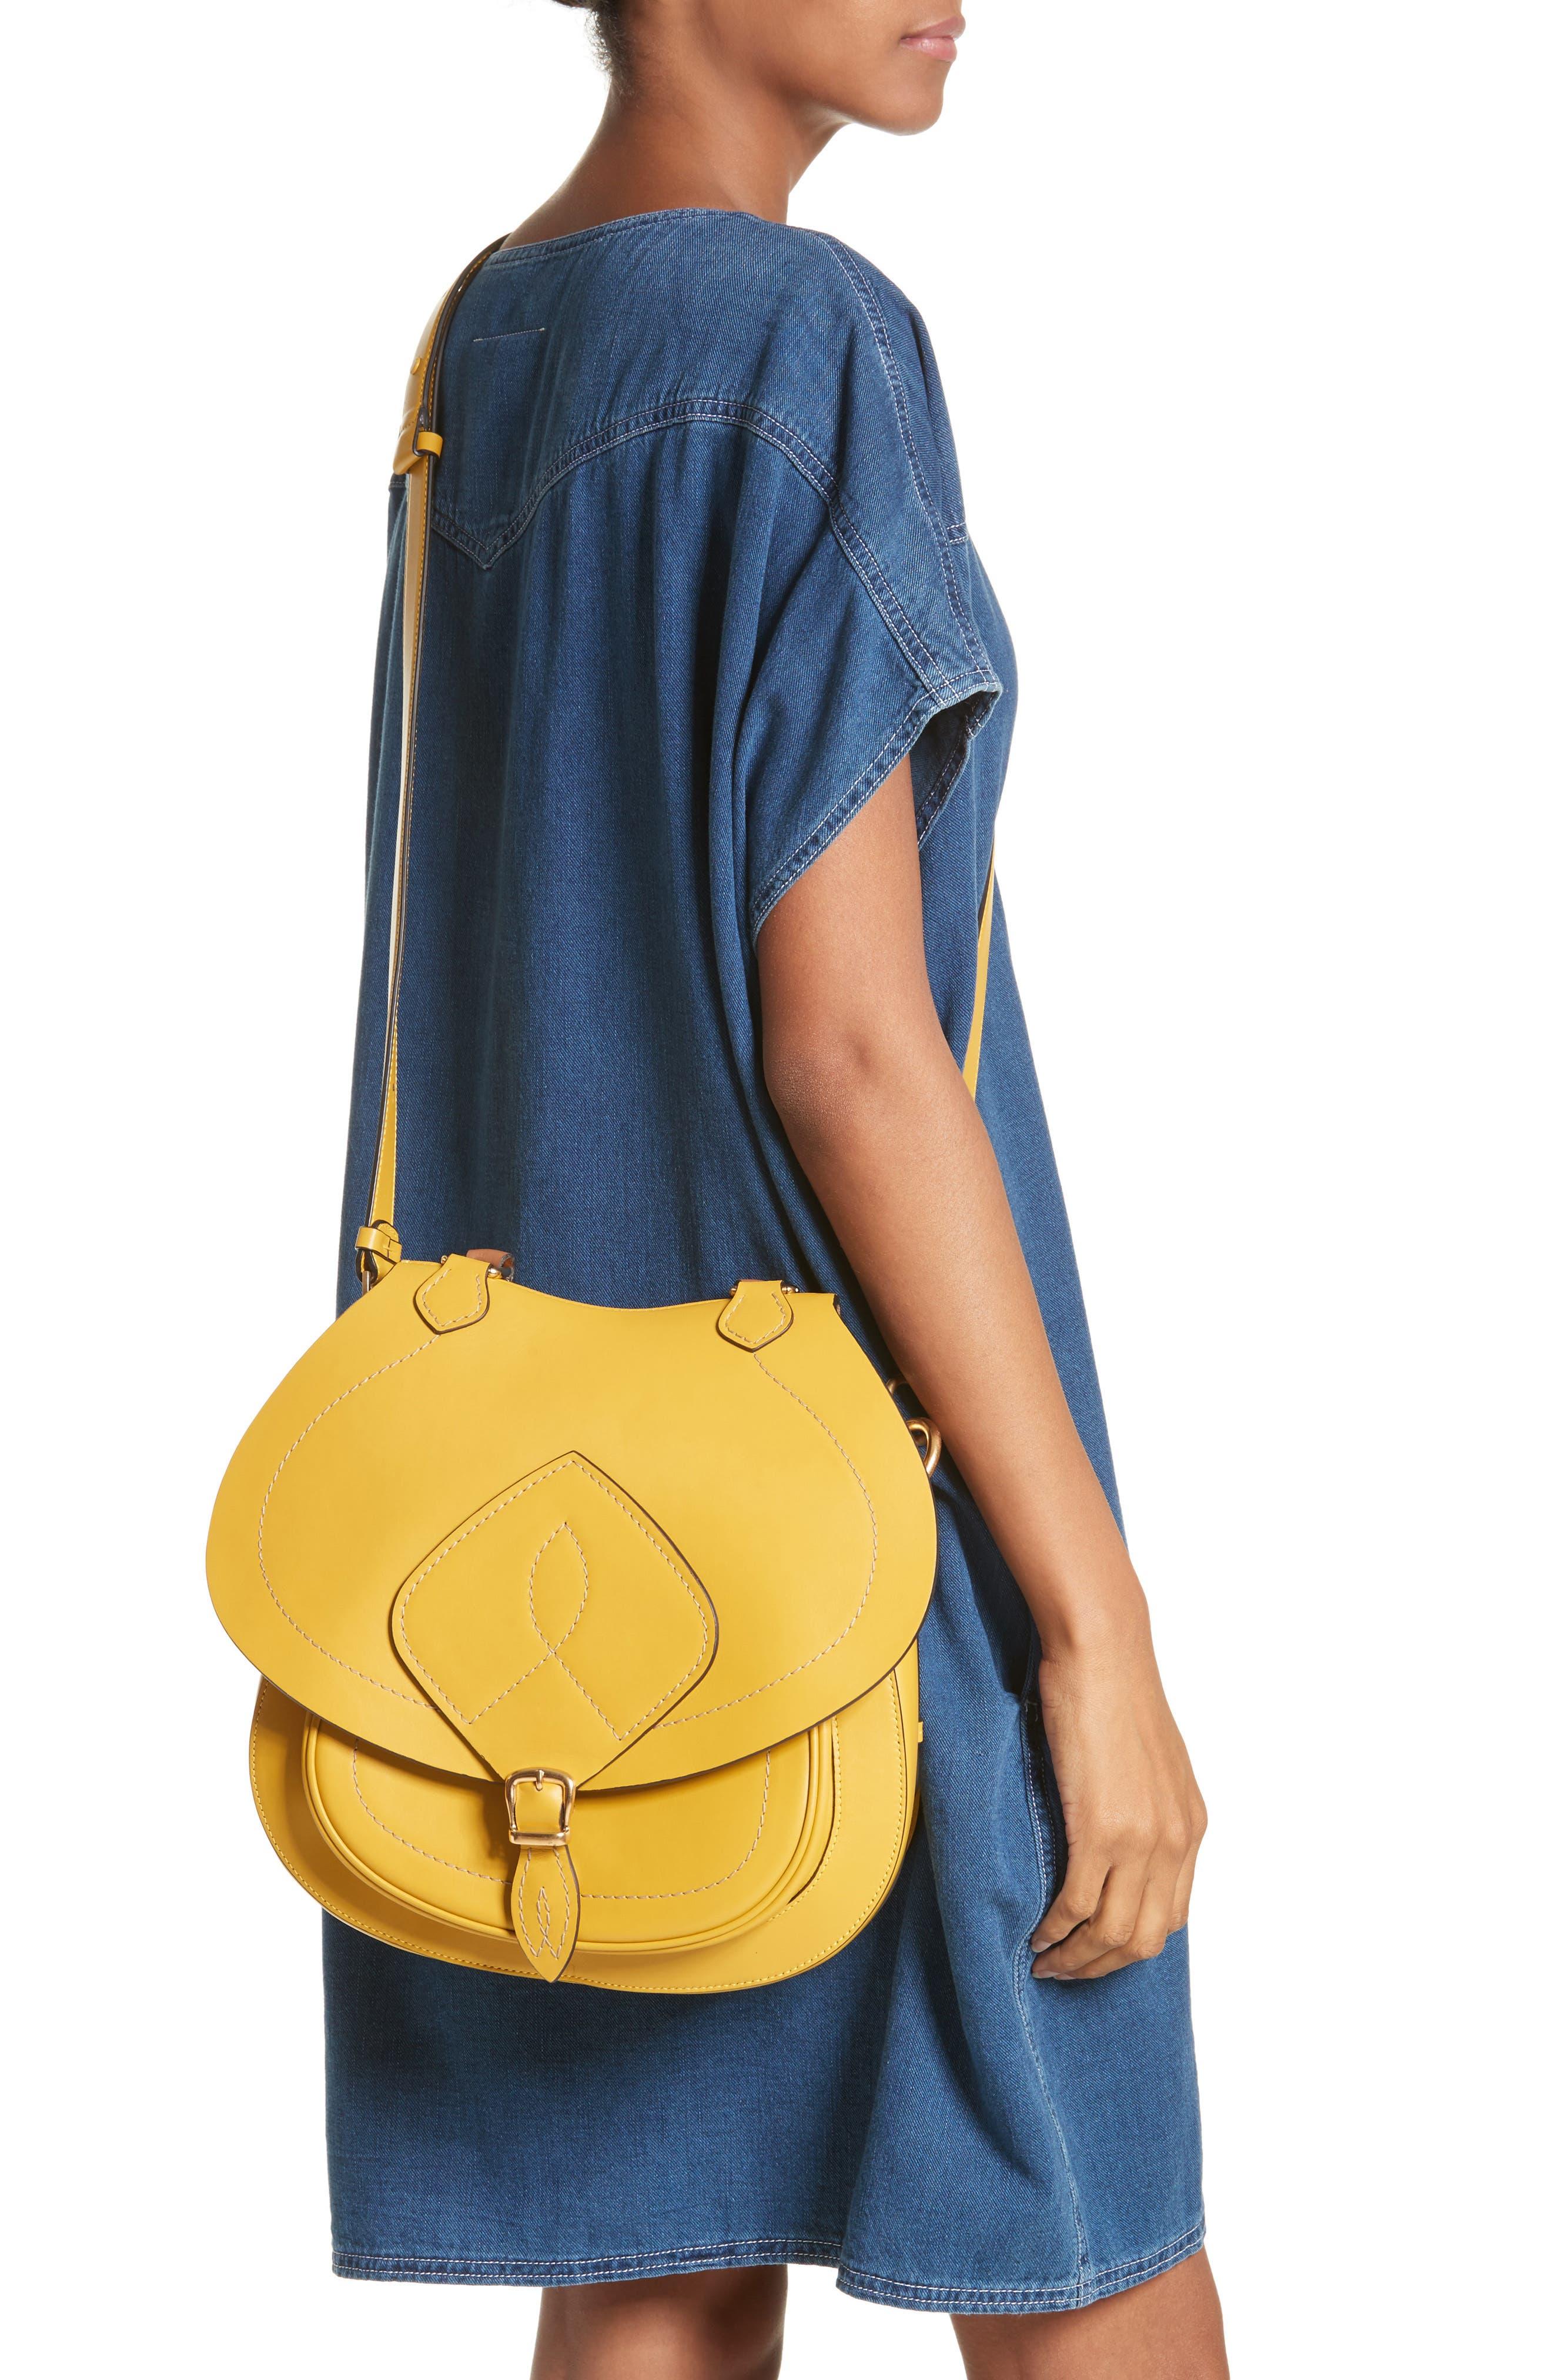 Large Bag Slide Leather Saddle Bag,                             Alternate thumbnail 2, color,                             YELLOW